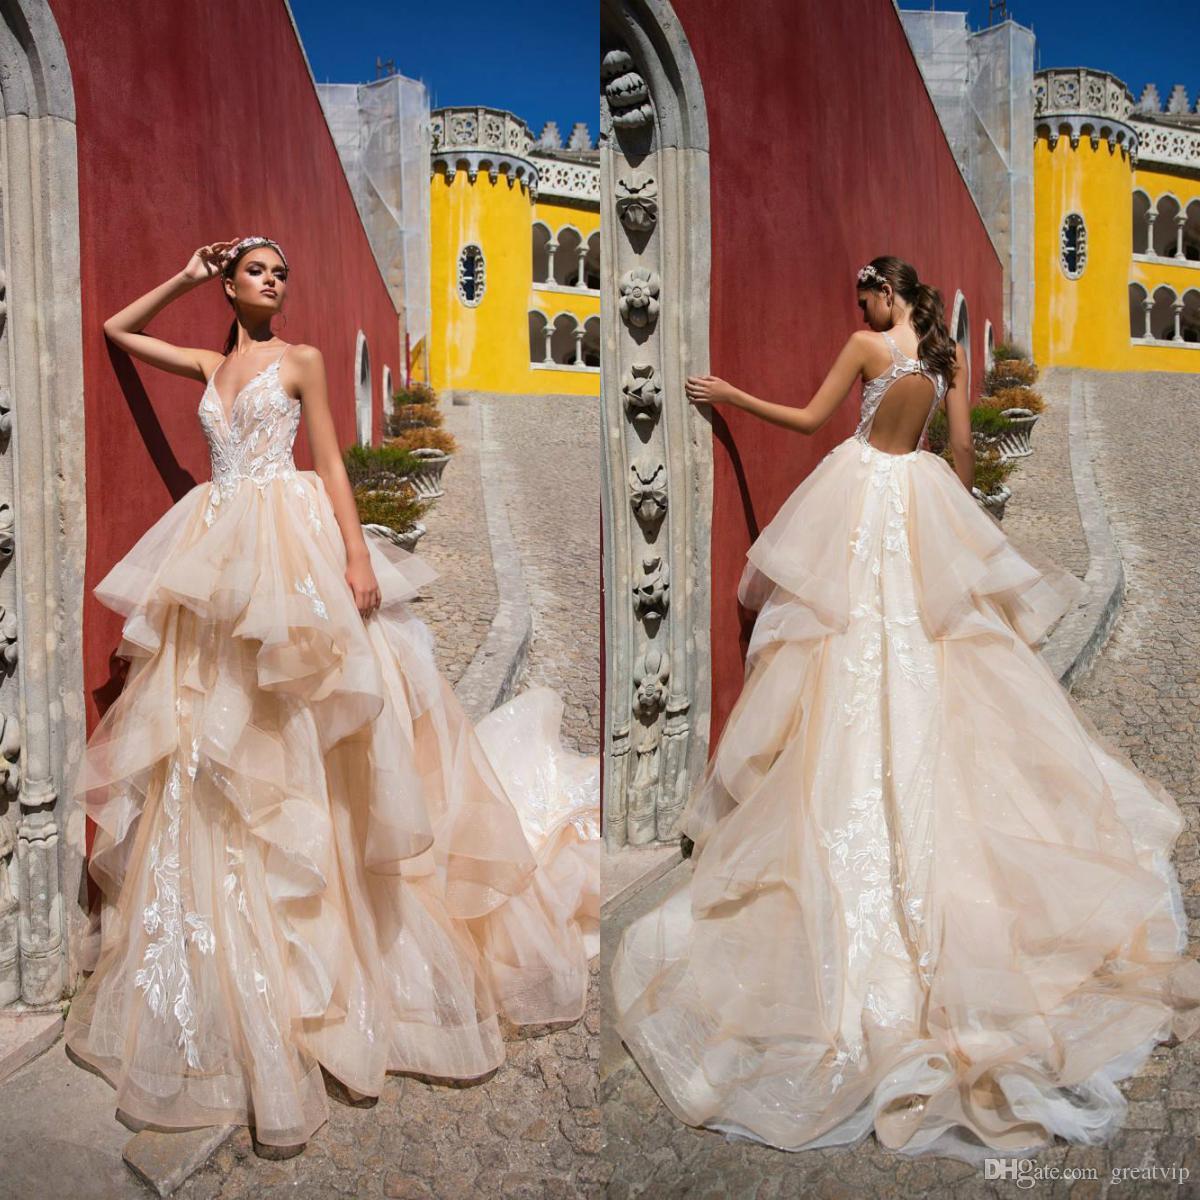 2019 Milla Nova Beach Robes de mariée spaghetti volants en dentelle Backless Tieres Plus Size Robes de mariée Boho Chic robe de mariée